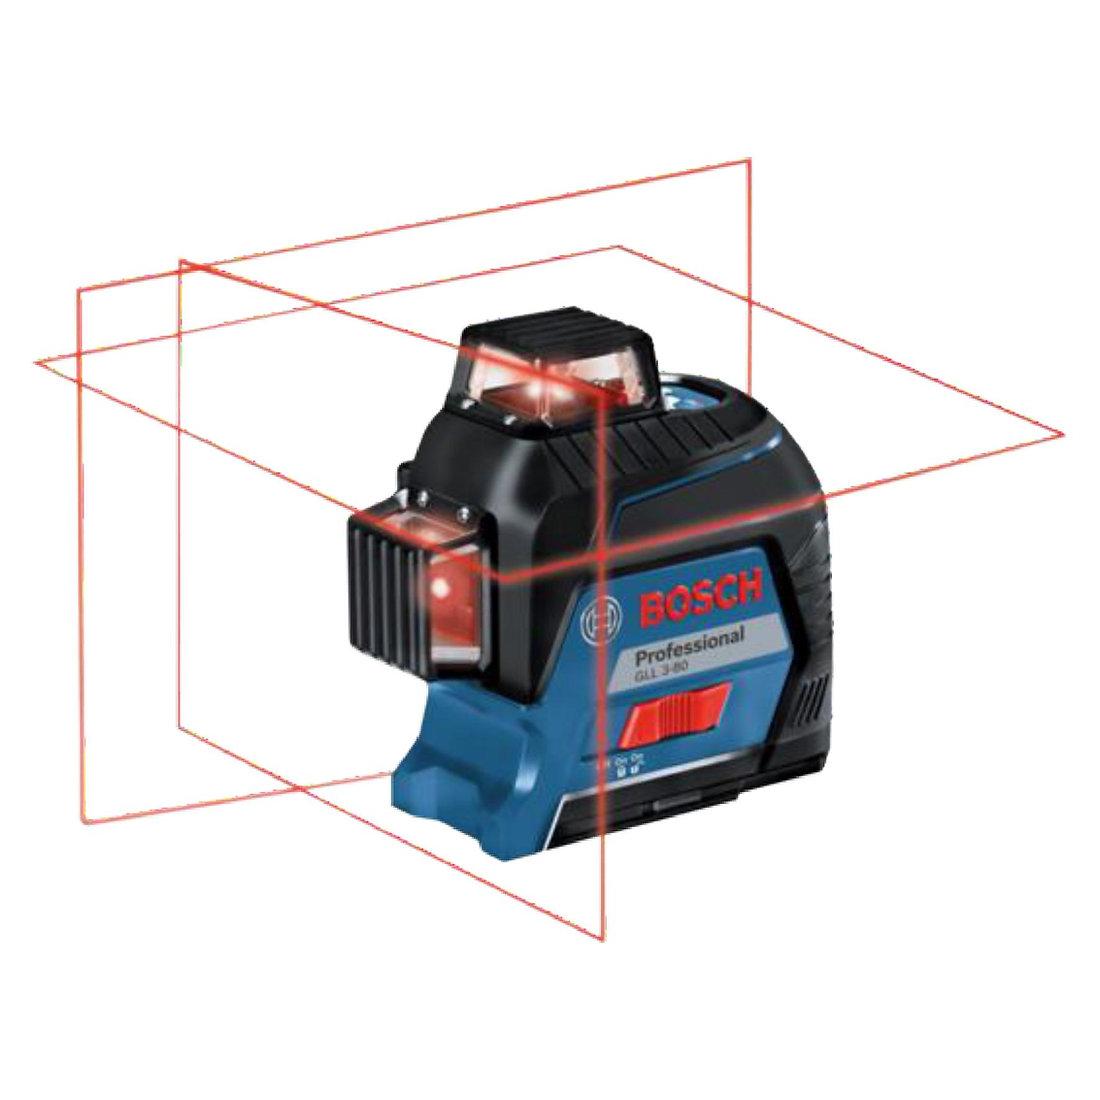 GLL 3-80 Professional